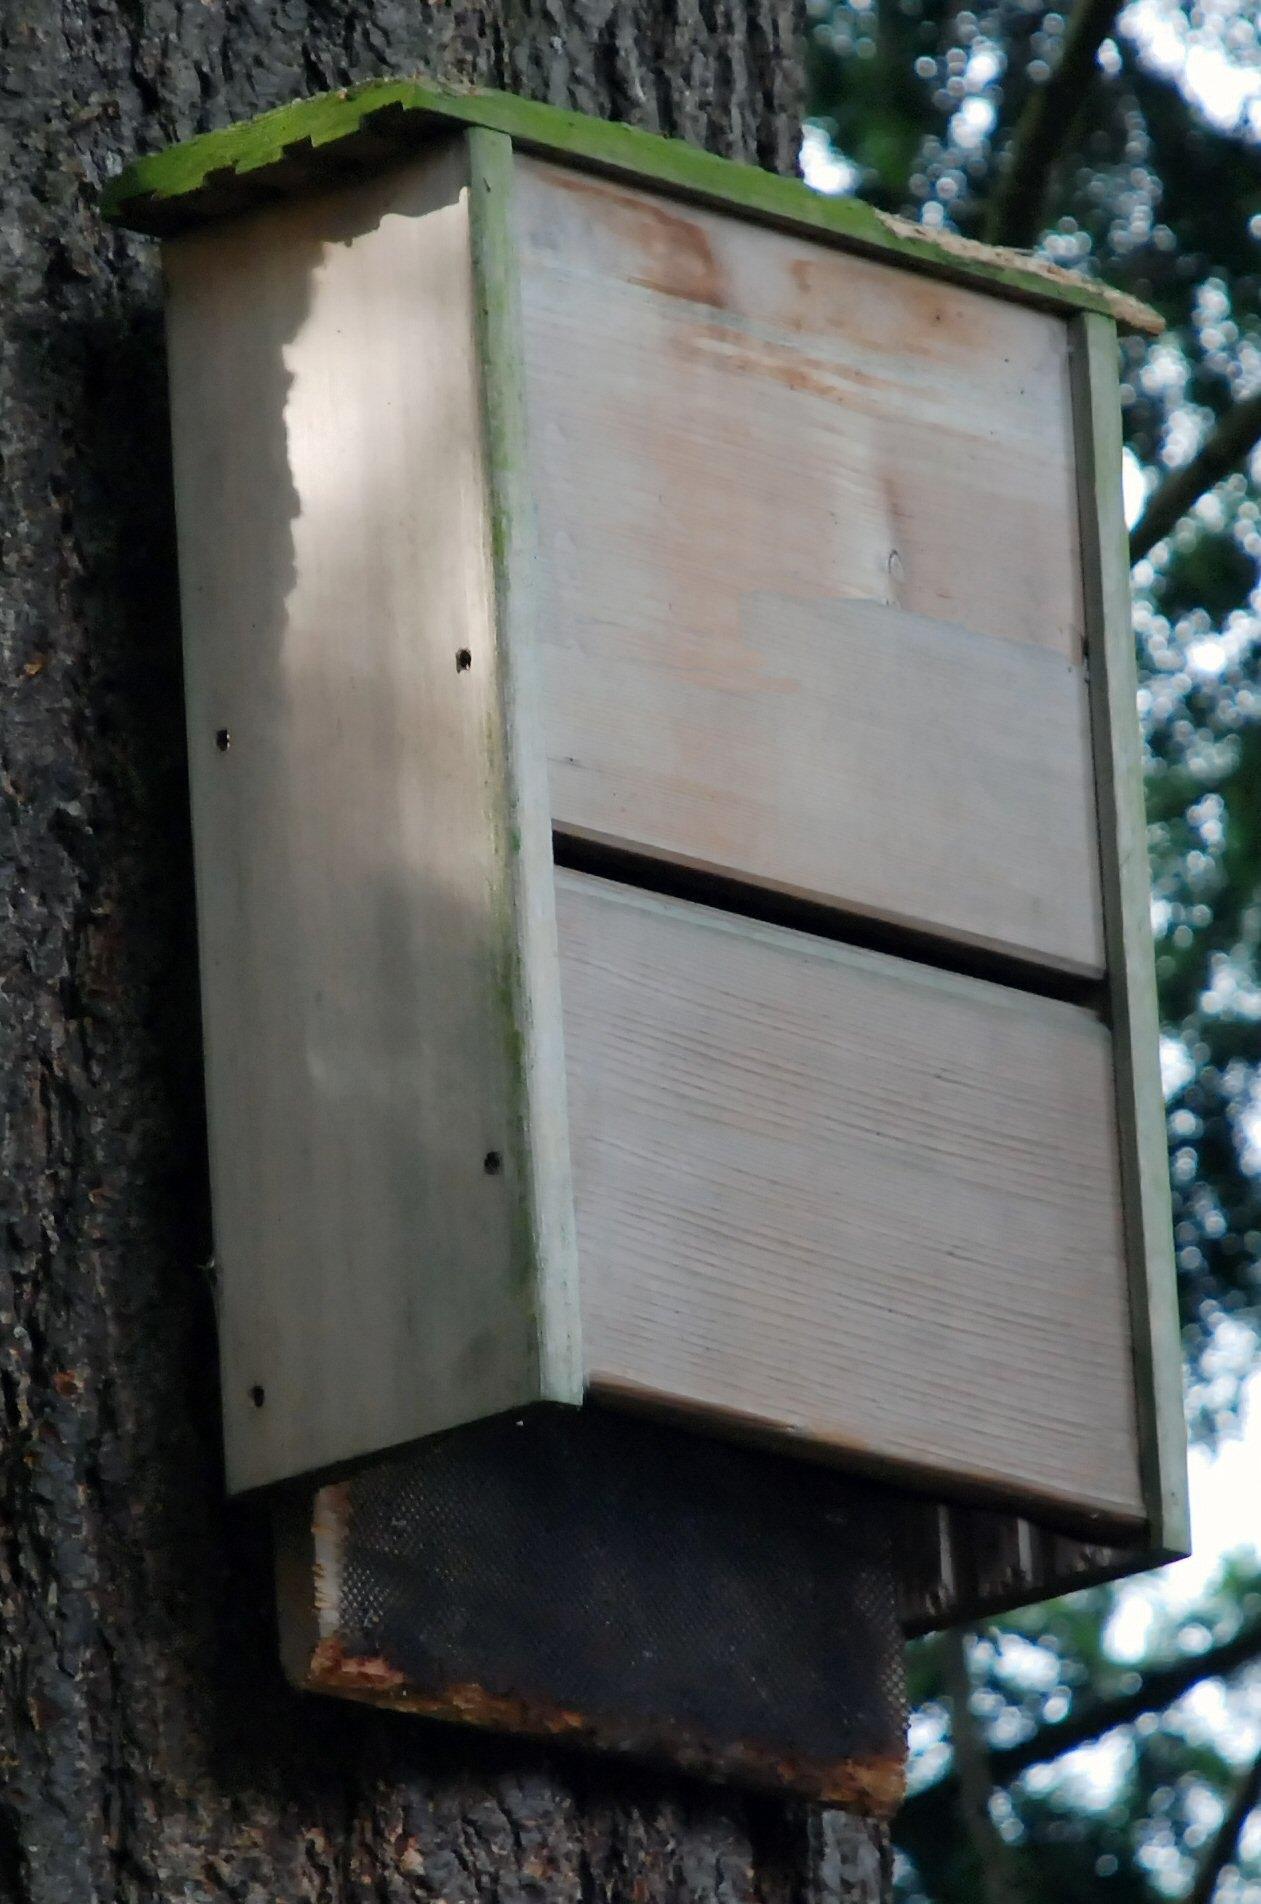 How To Make Bat House